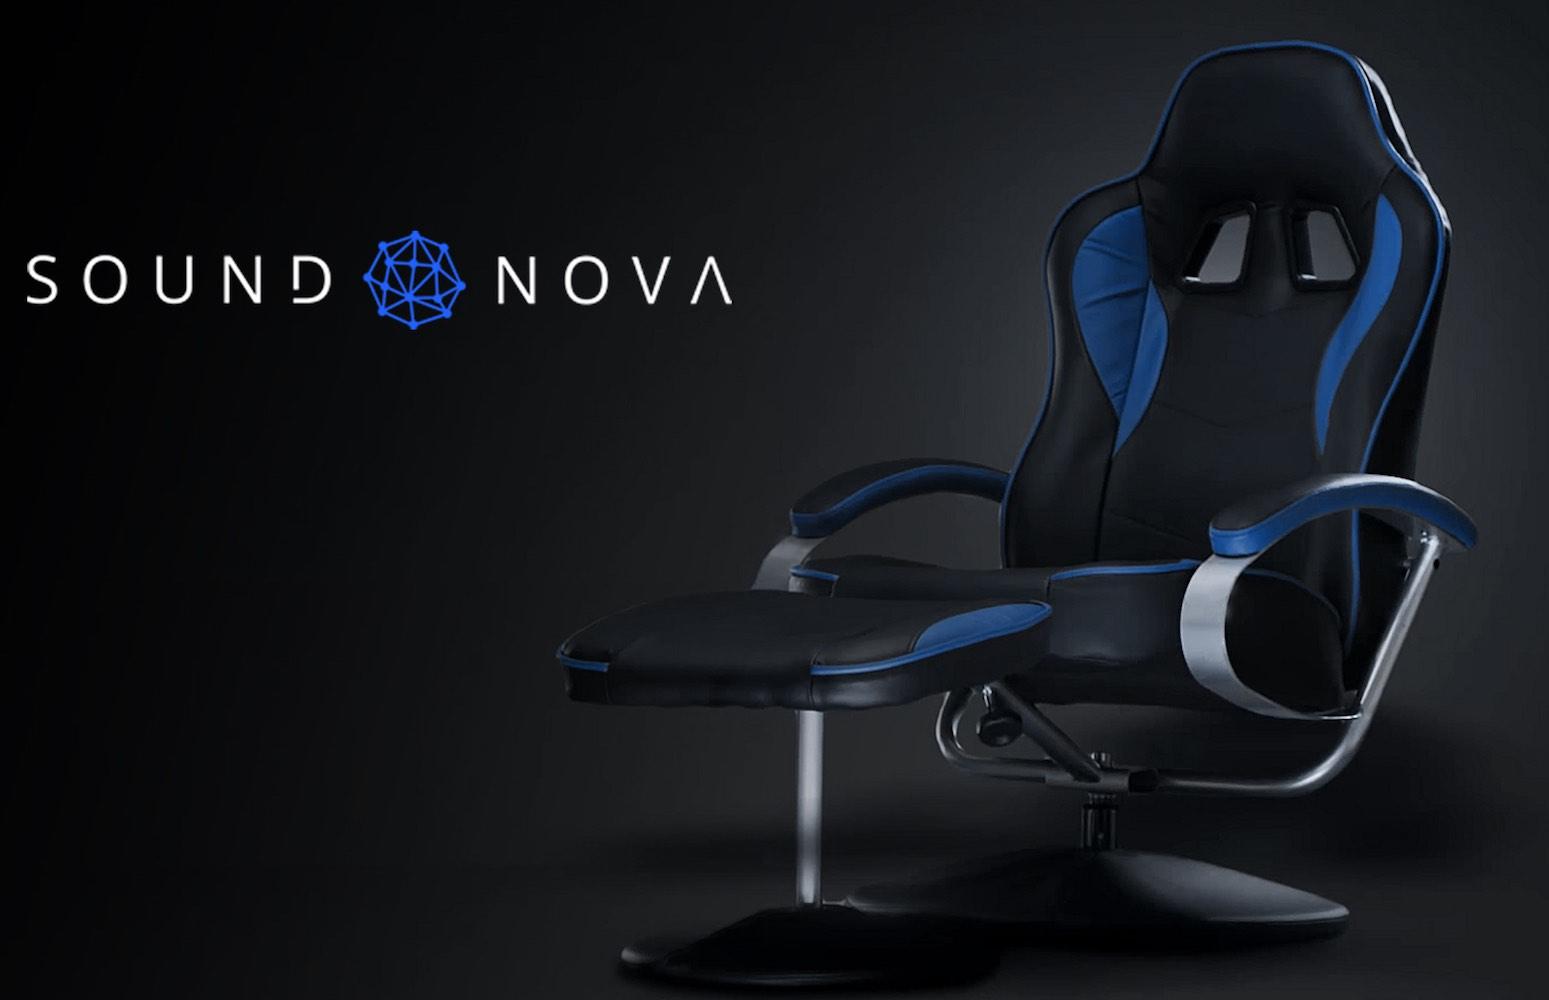 SoundNova – A Futuristic Interactive Chair